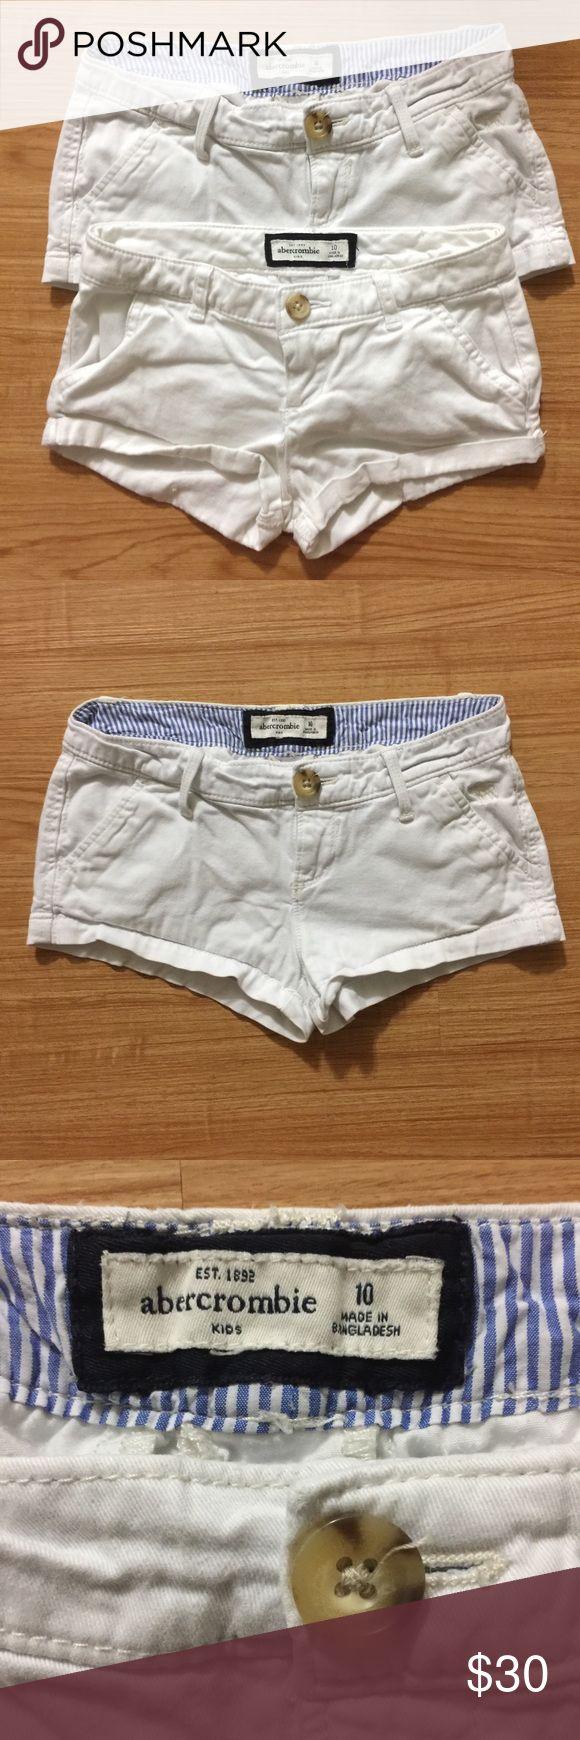 2 Girls white Abercrombie kids shorts. Size 10. 2 Girls white Abercrombie kids shorts. Size 10. abercrombie kids Bottoms Shorts